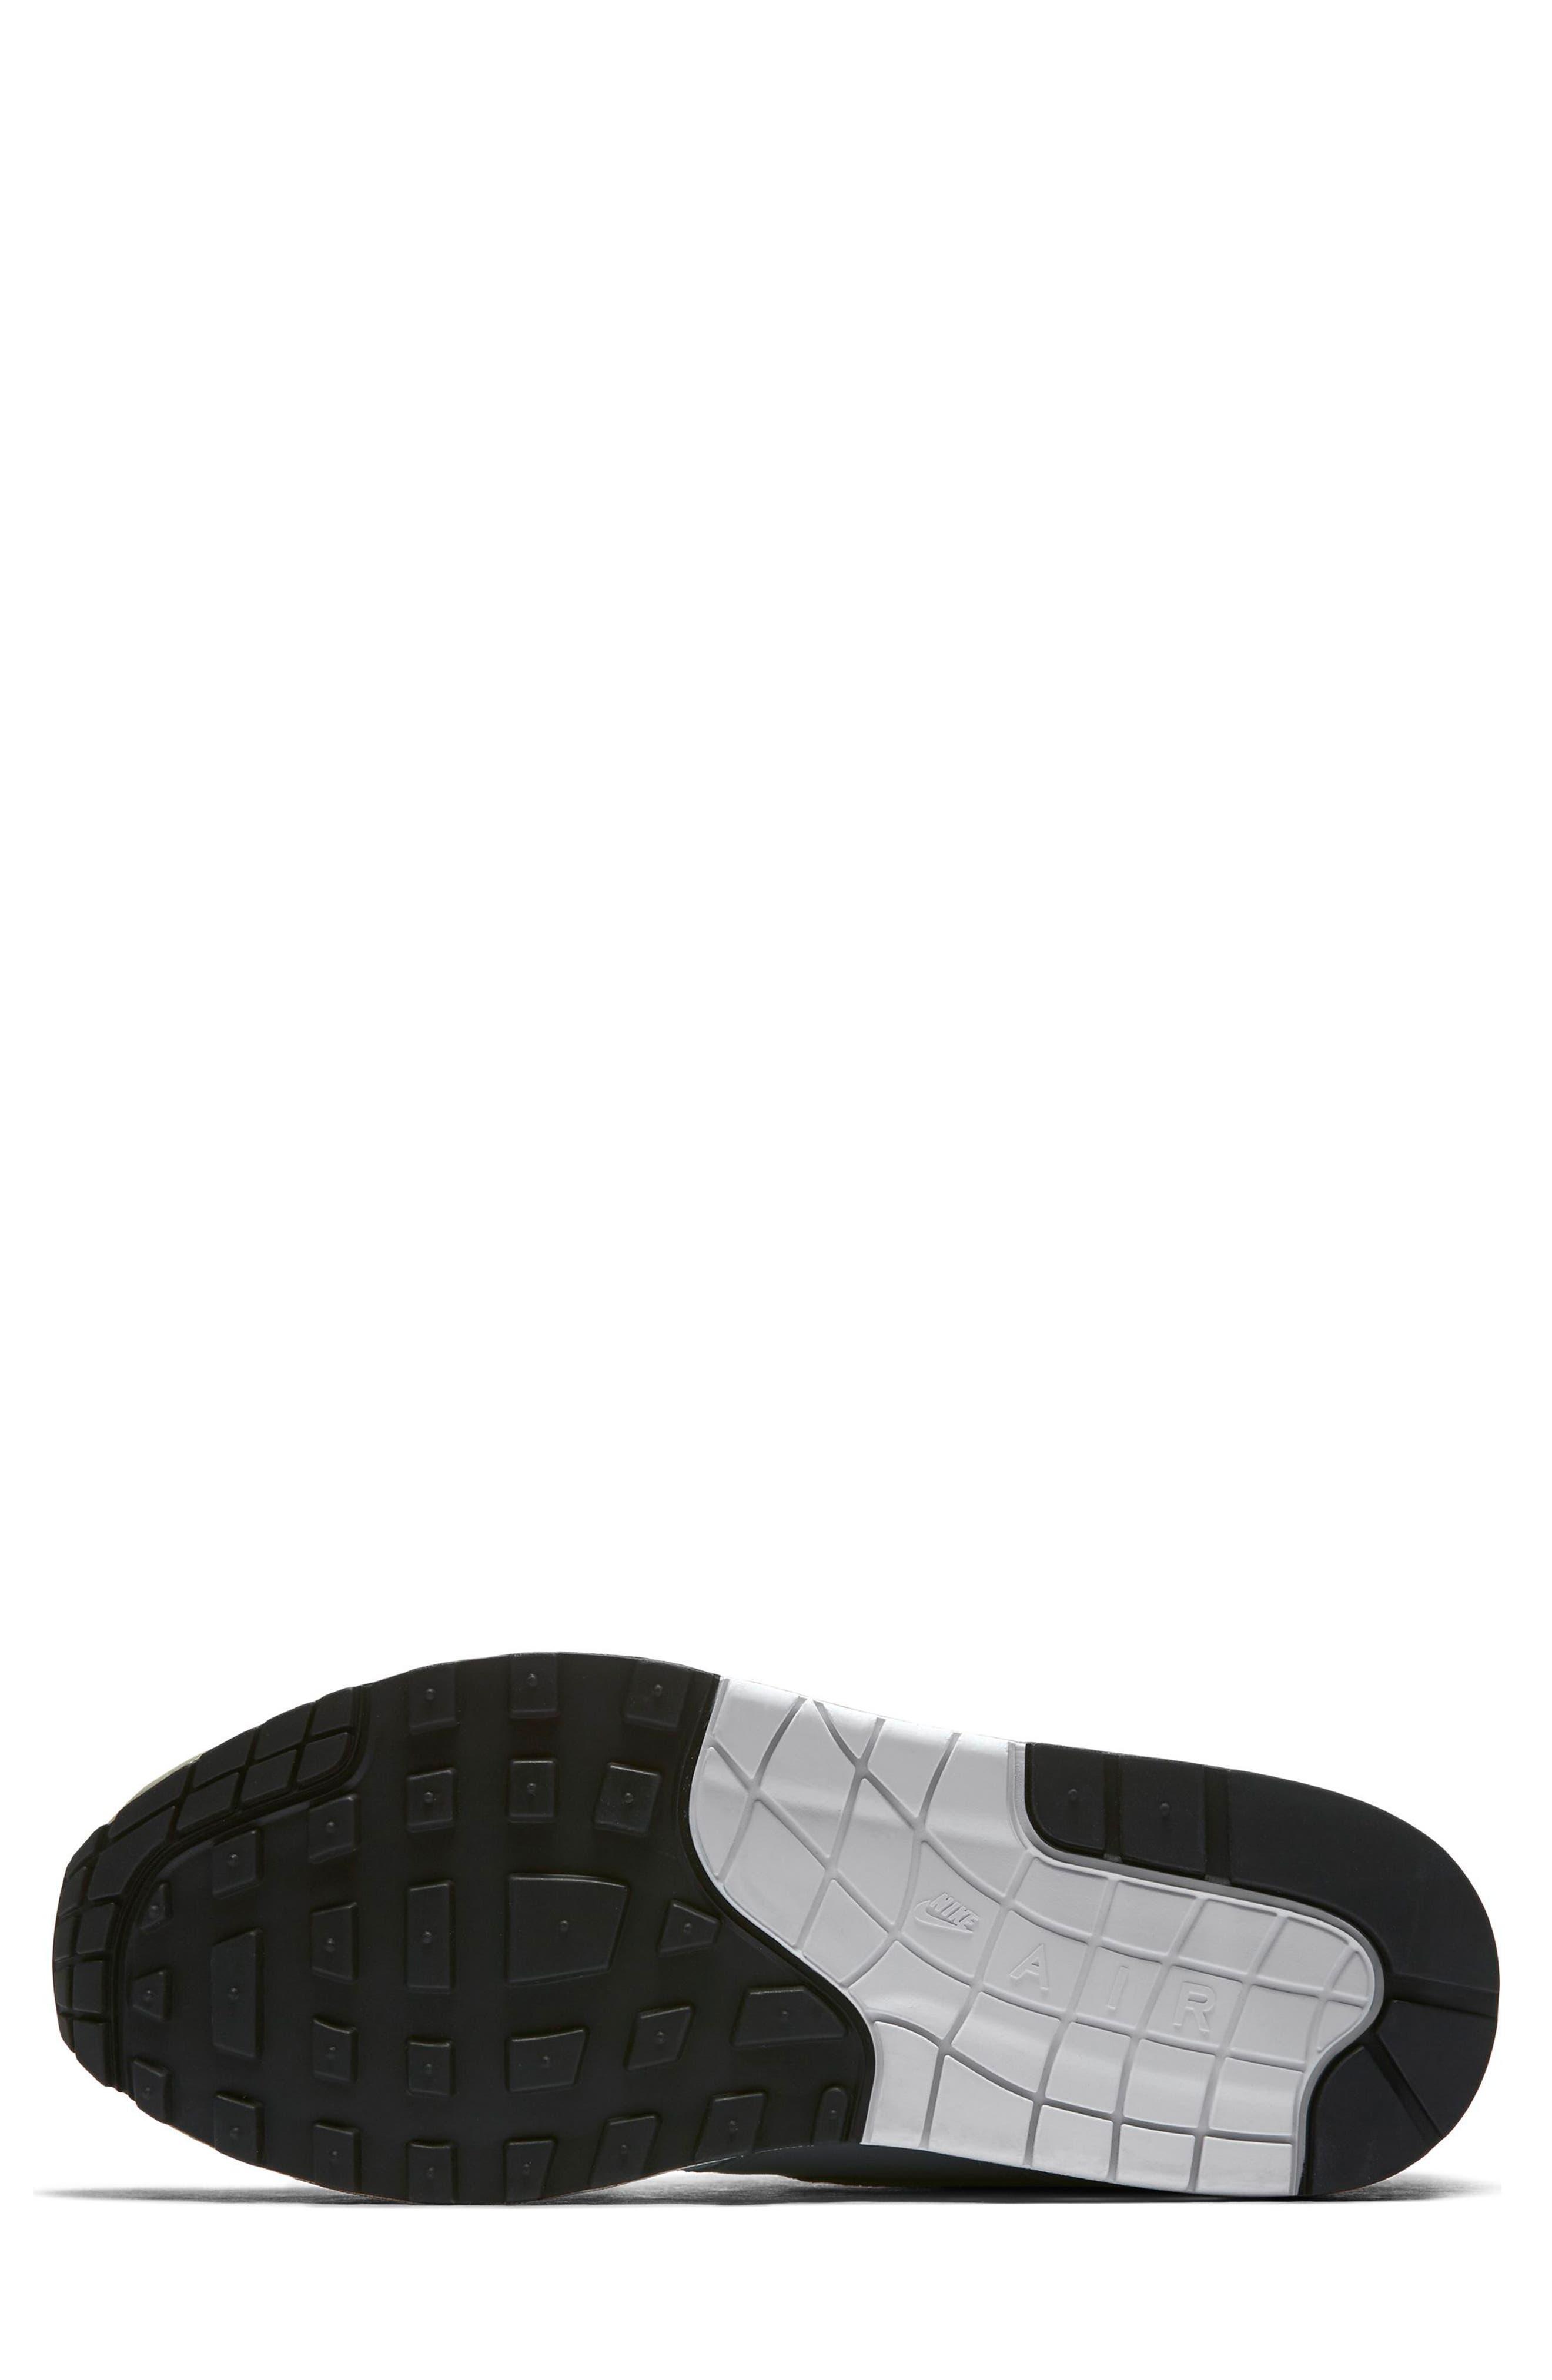 Air Max 1 Sneaker,                             Alternate thumbnail 5, color,                             White/ Dark Stucco